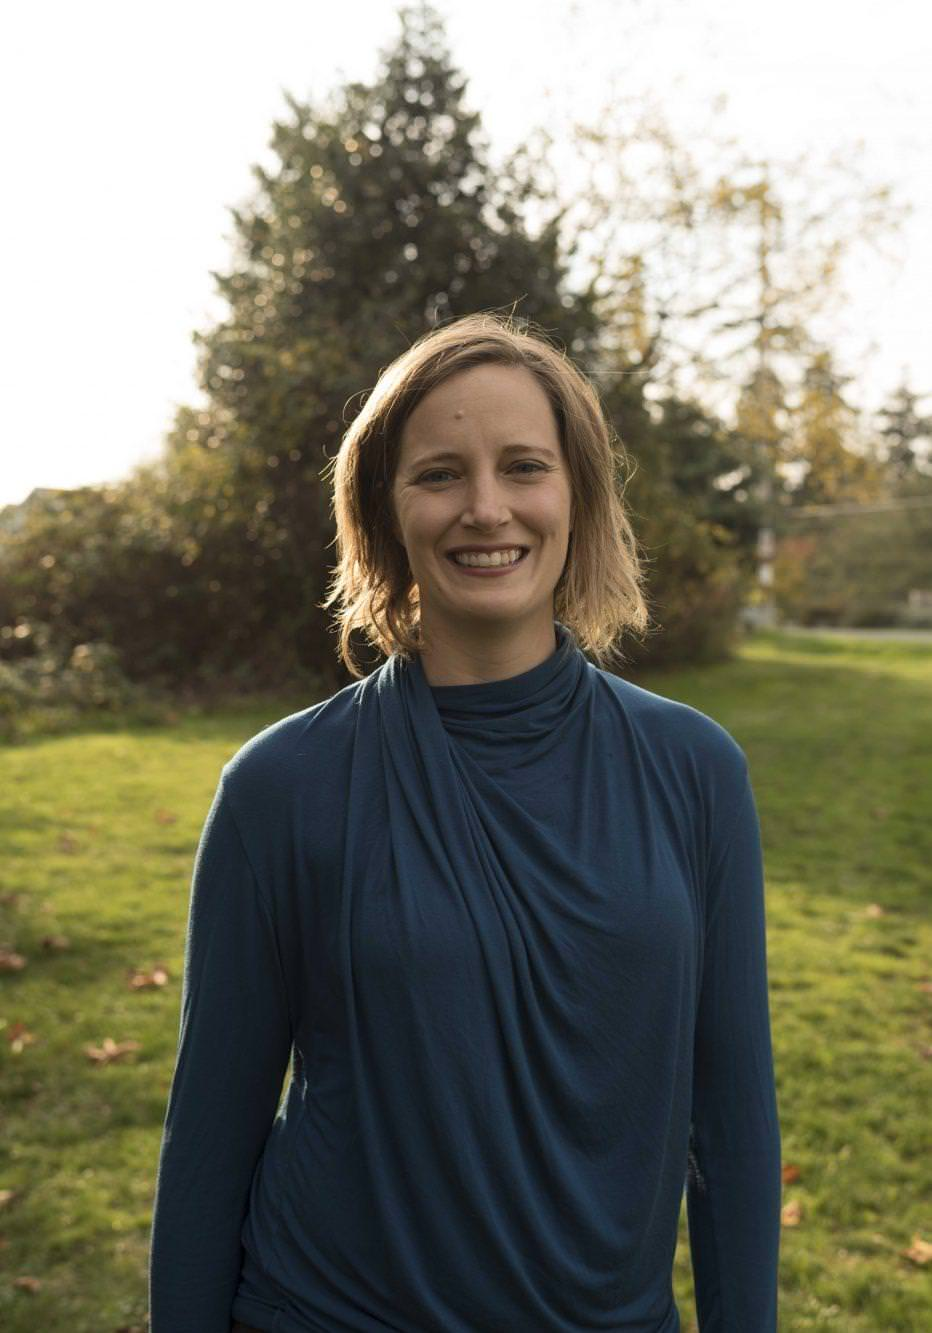 Alison Gillespie